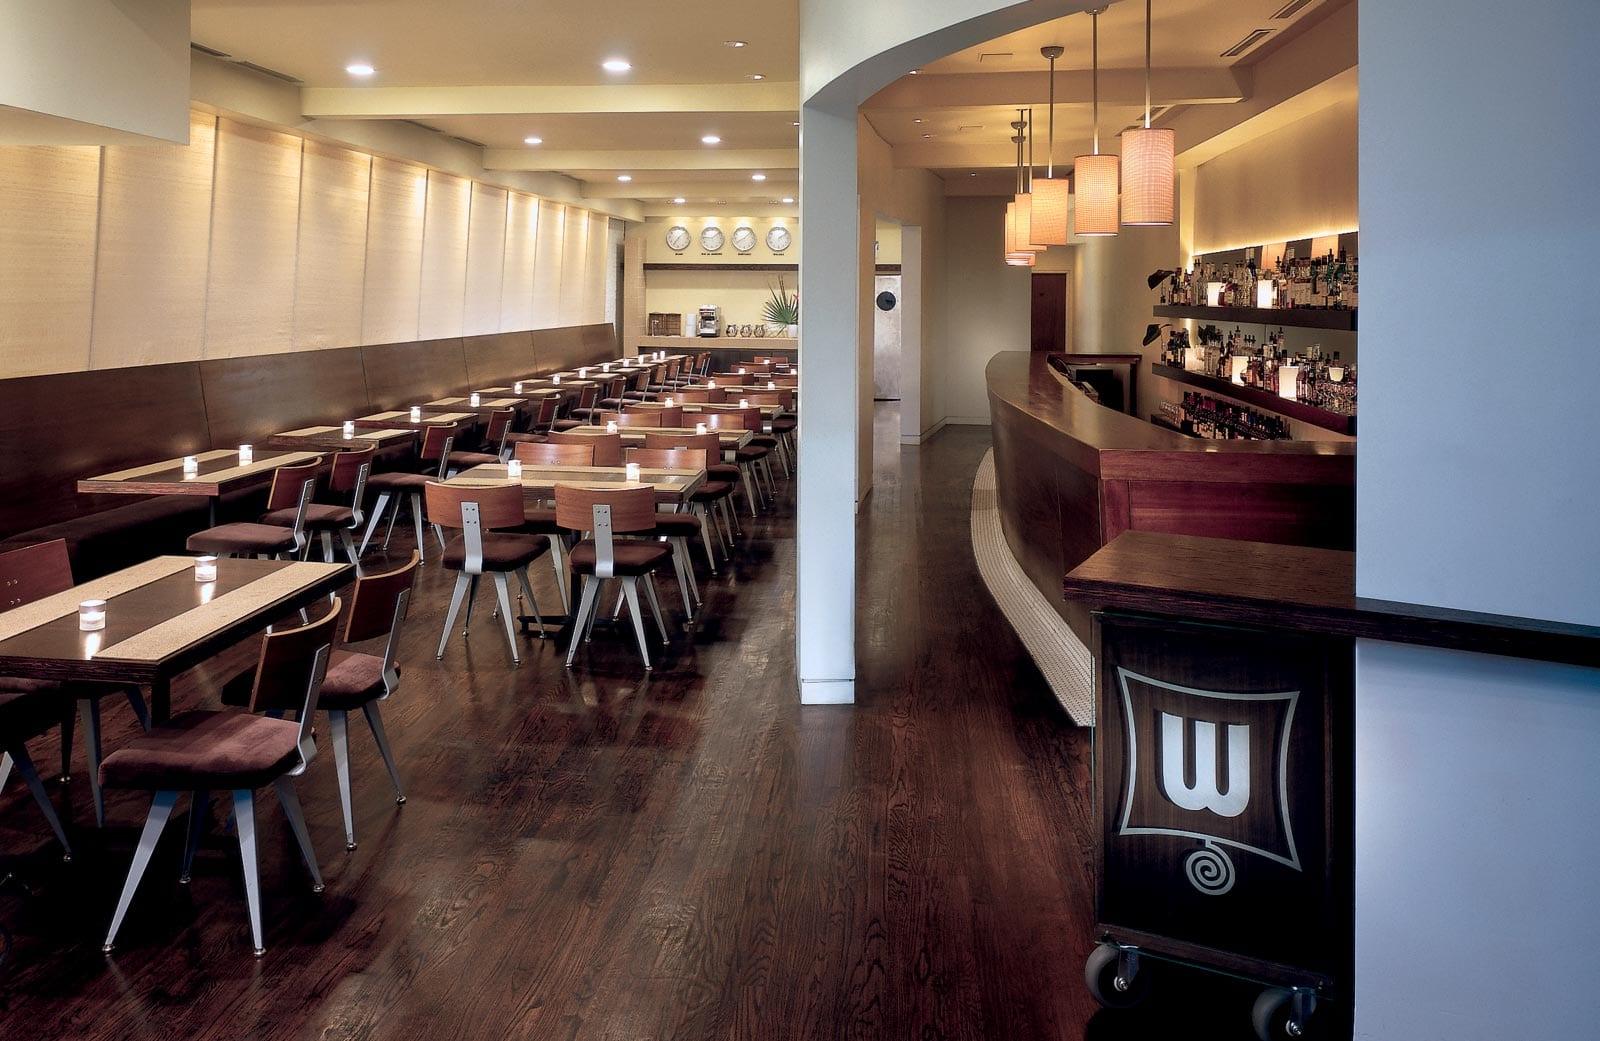 watusi - nightclub design, bar & restaurant designbig time